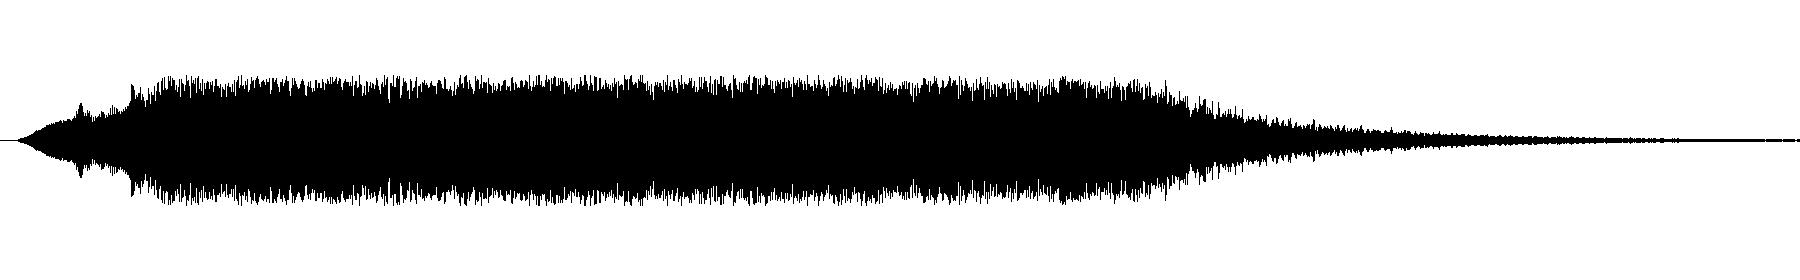 20170119 02 130bpm amin   spheres 001